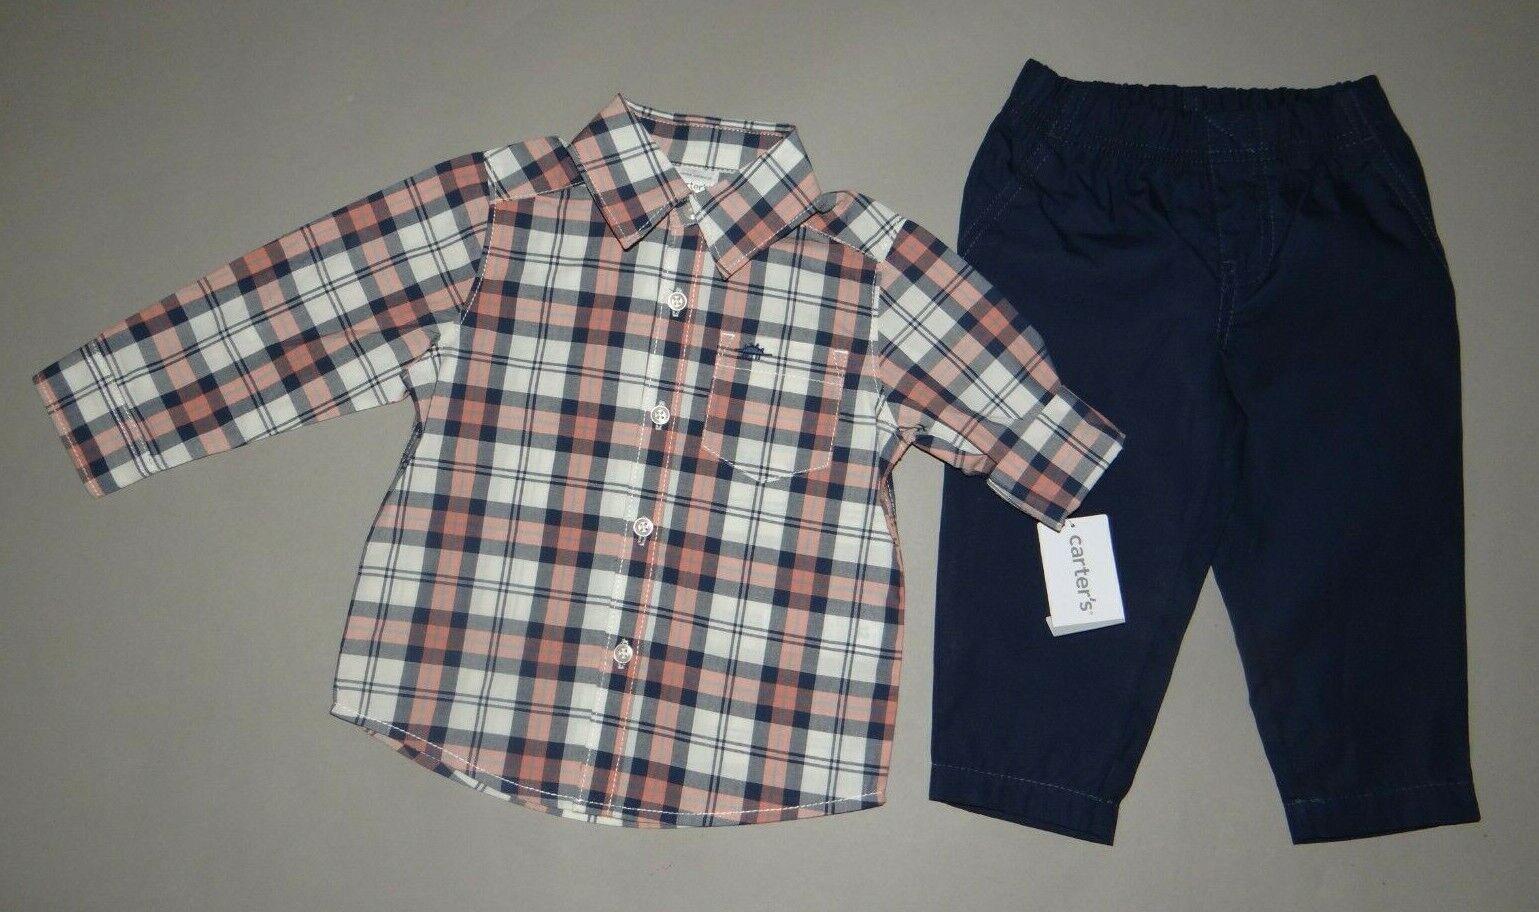 Baby/Toddler boy clothes, 5T, Carter's 2 piece set/SEE DETAI